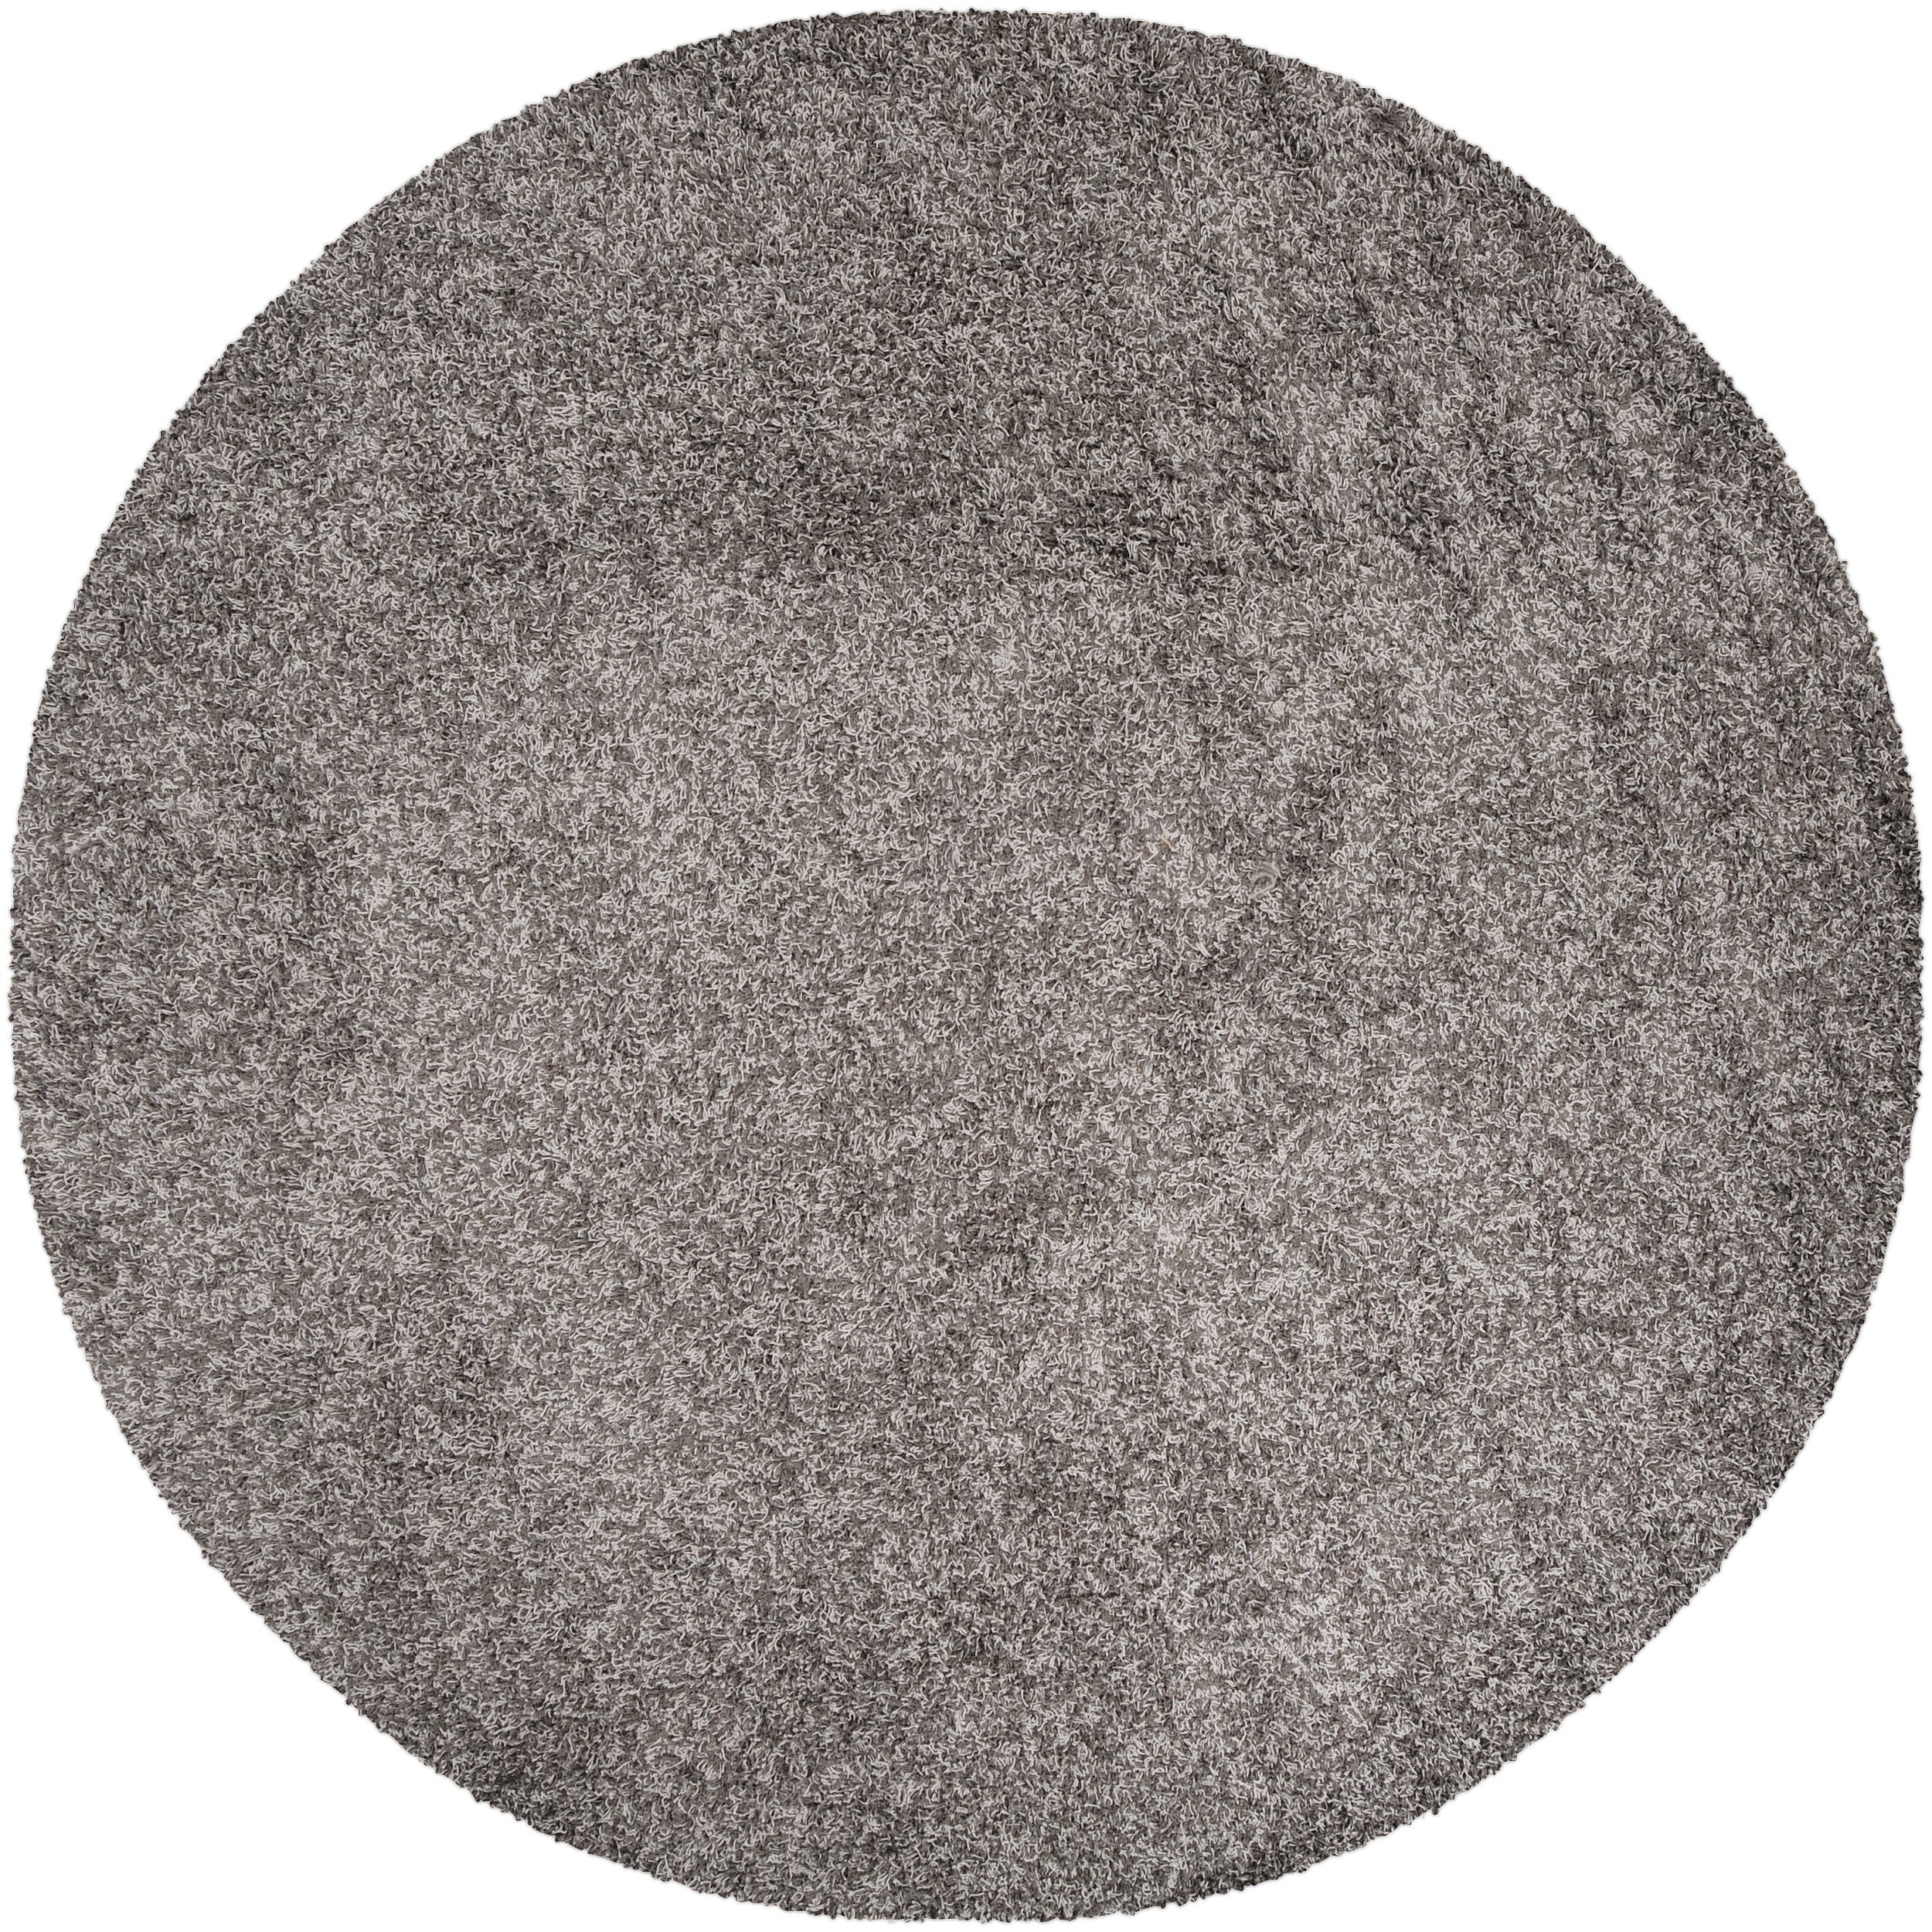 Woven Gray Idealy Plush Shag (4' Round)